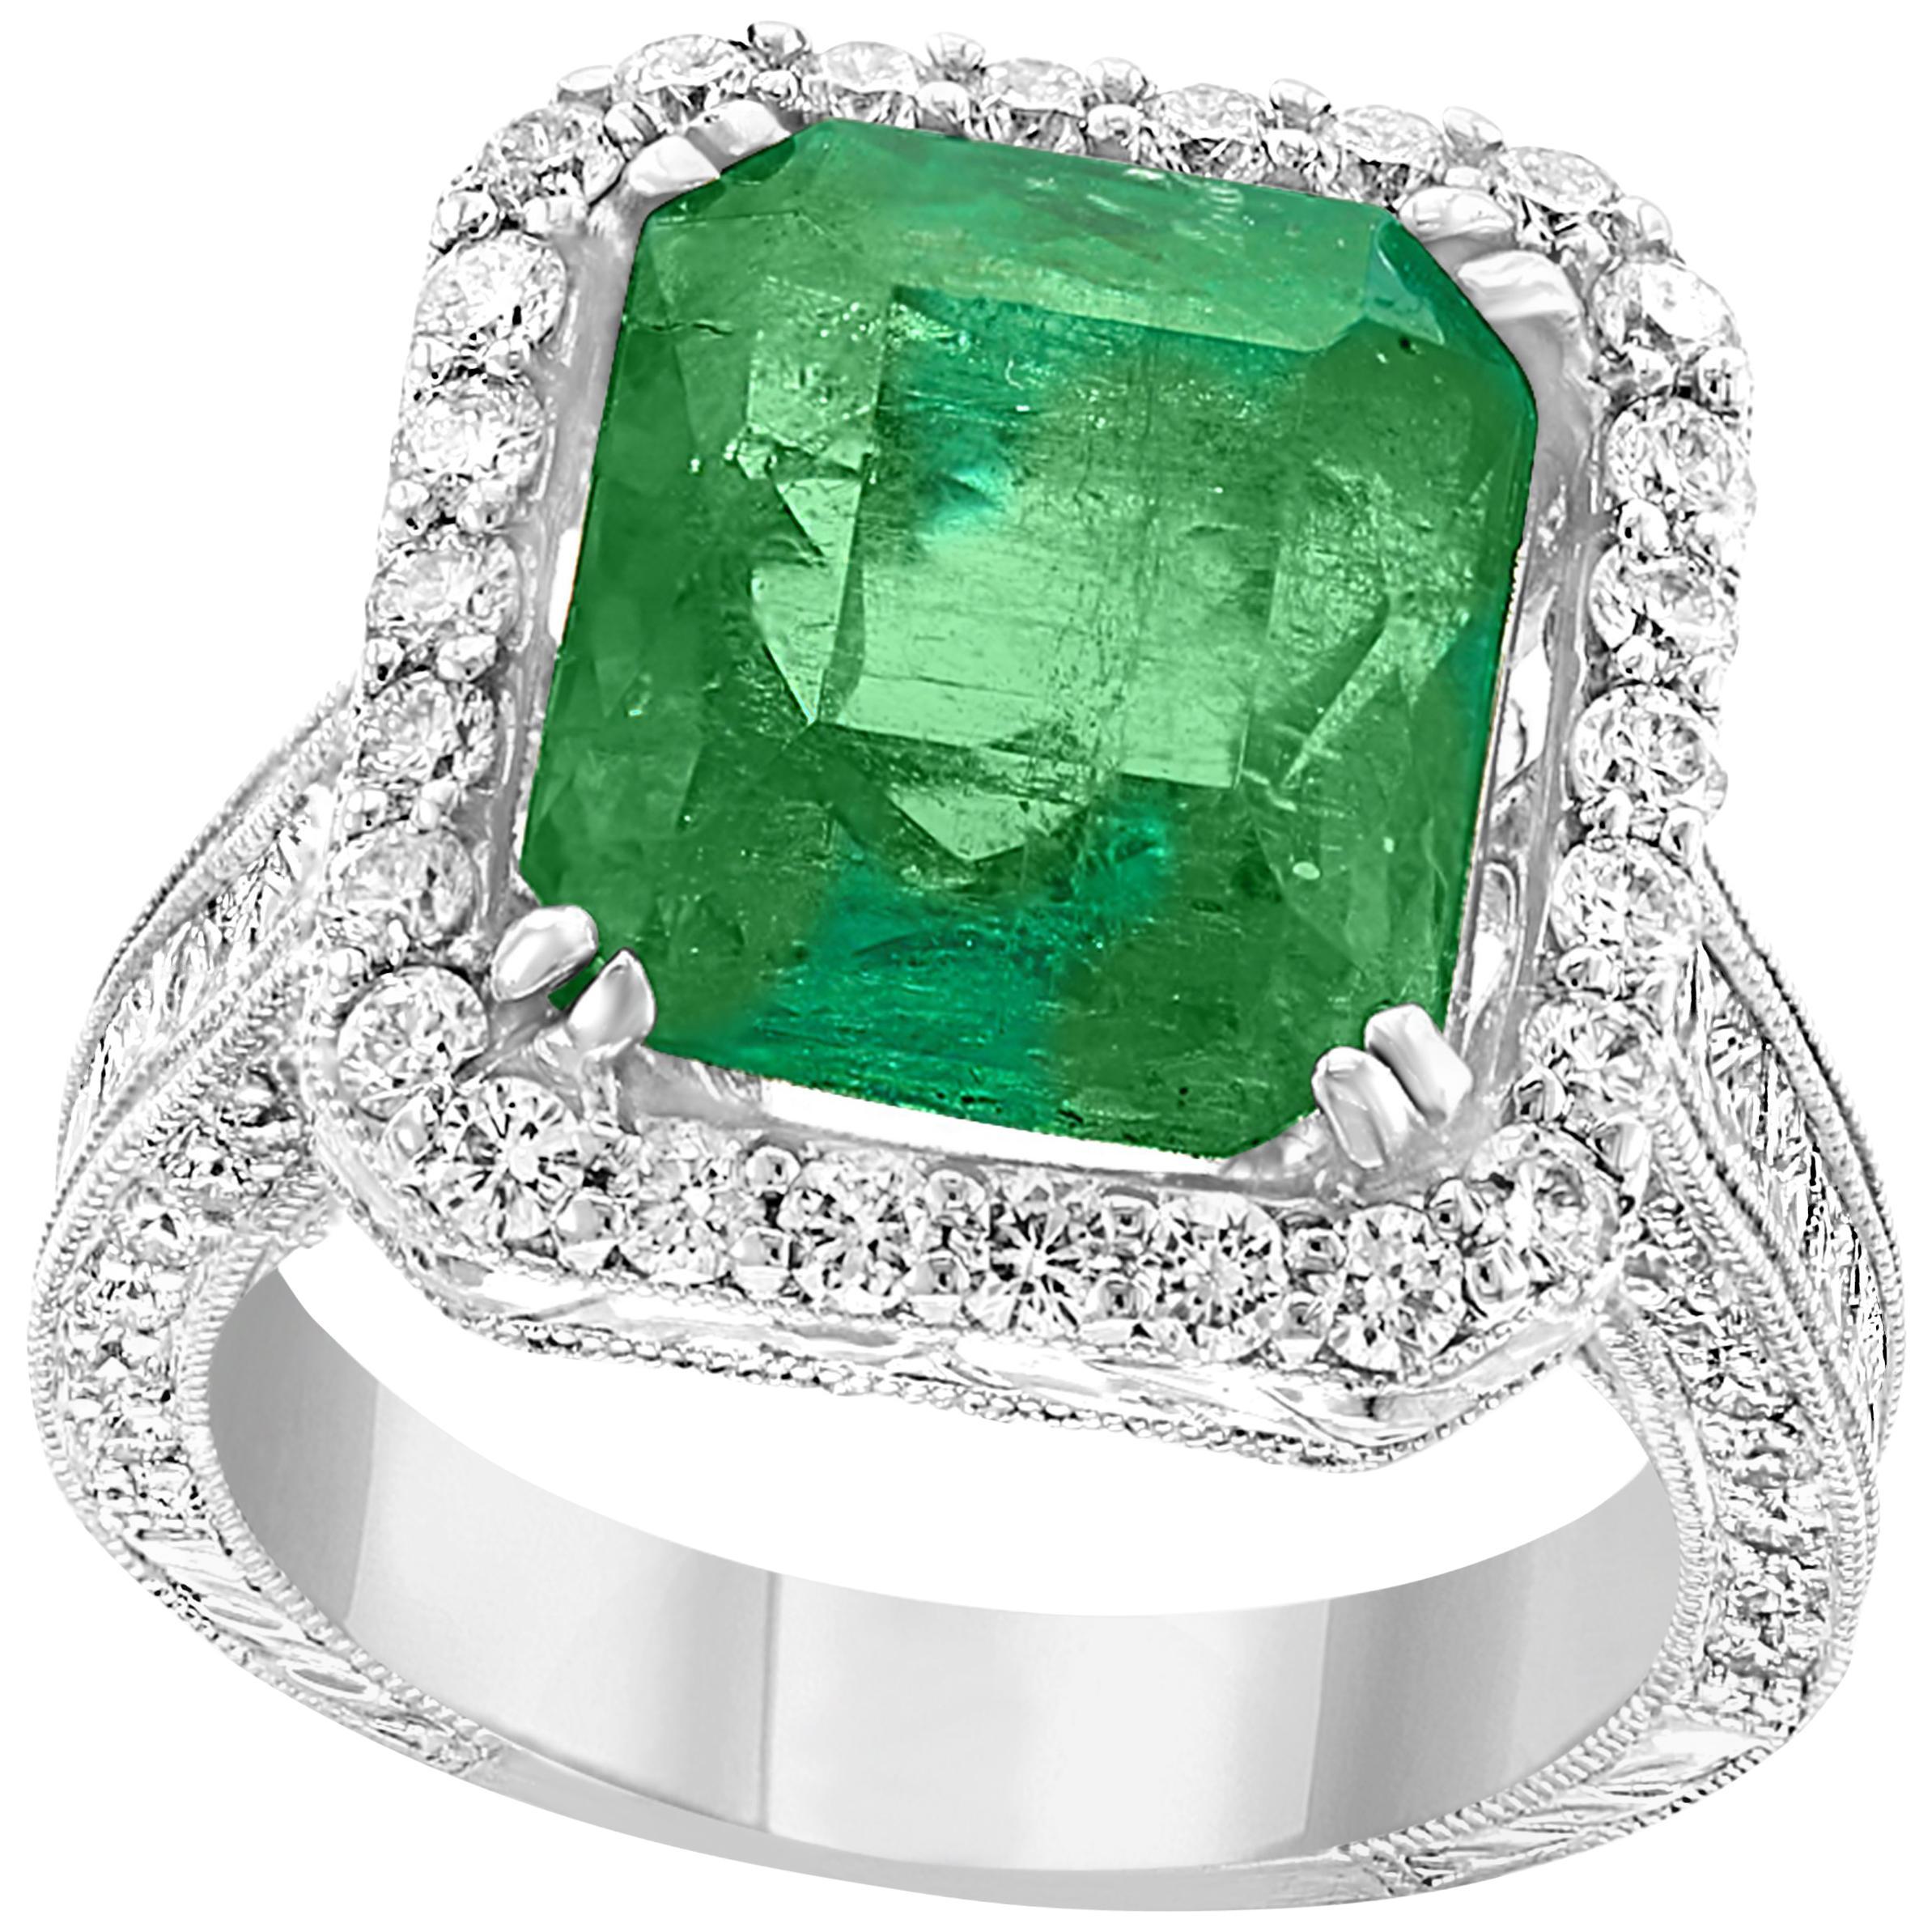 8 Carat Emerald Cut Colombian Emerald and Diamond 18 Karat Gold Ring Estate